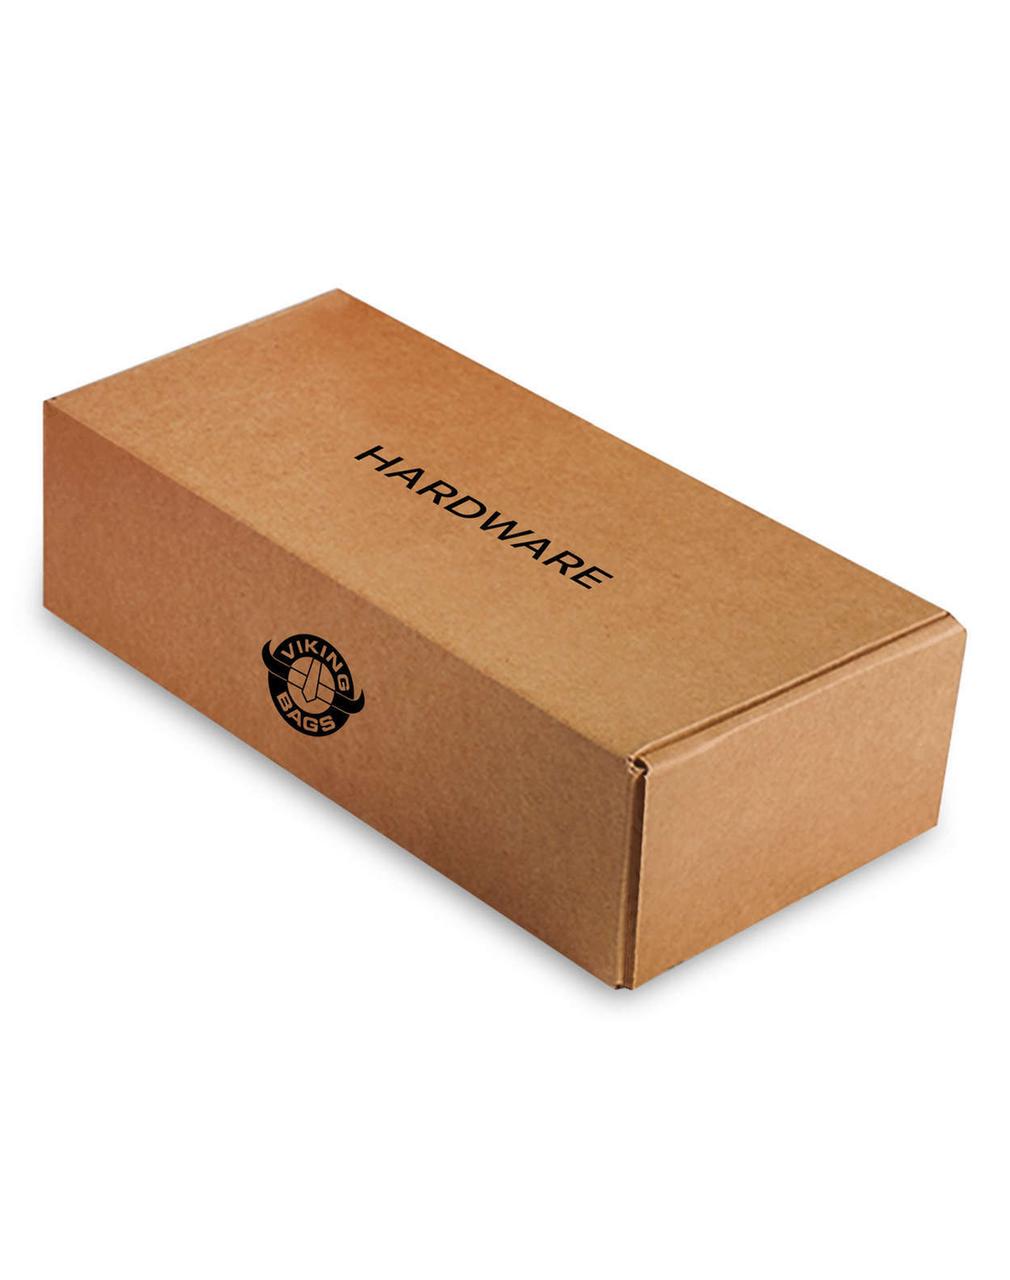 Boulevard M50, VZ800 Large Slanted Studded Bags box